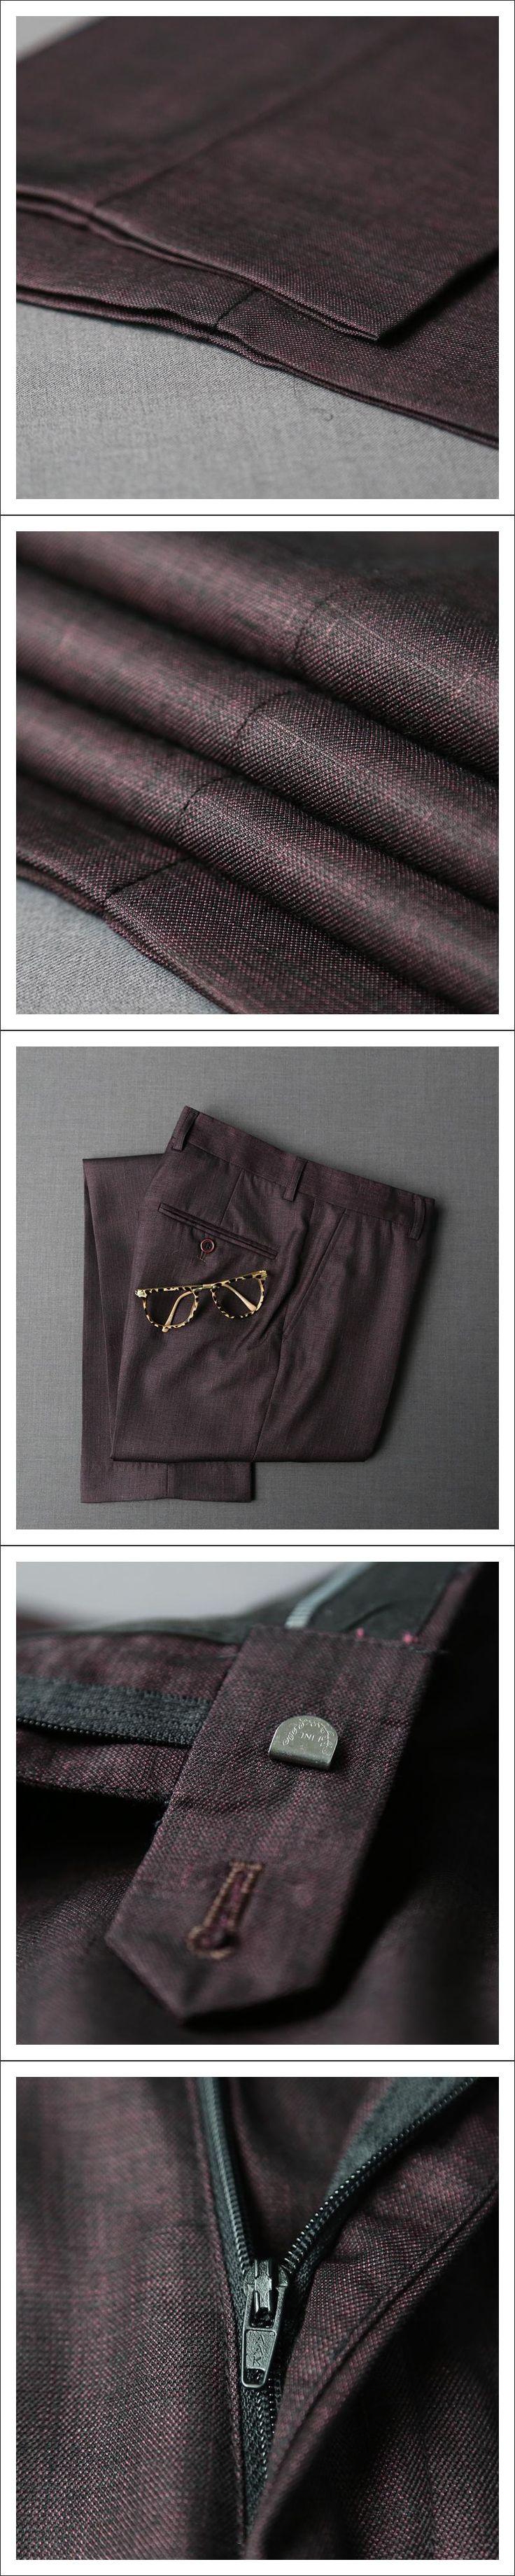 2017 Formal Wedding Men Purple Suit Pants Fashion Slim Fit Casual Brand Business Blazer Straight Dress Trousers 365kz02